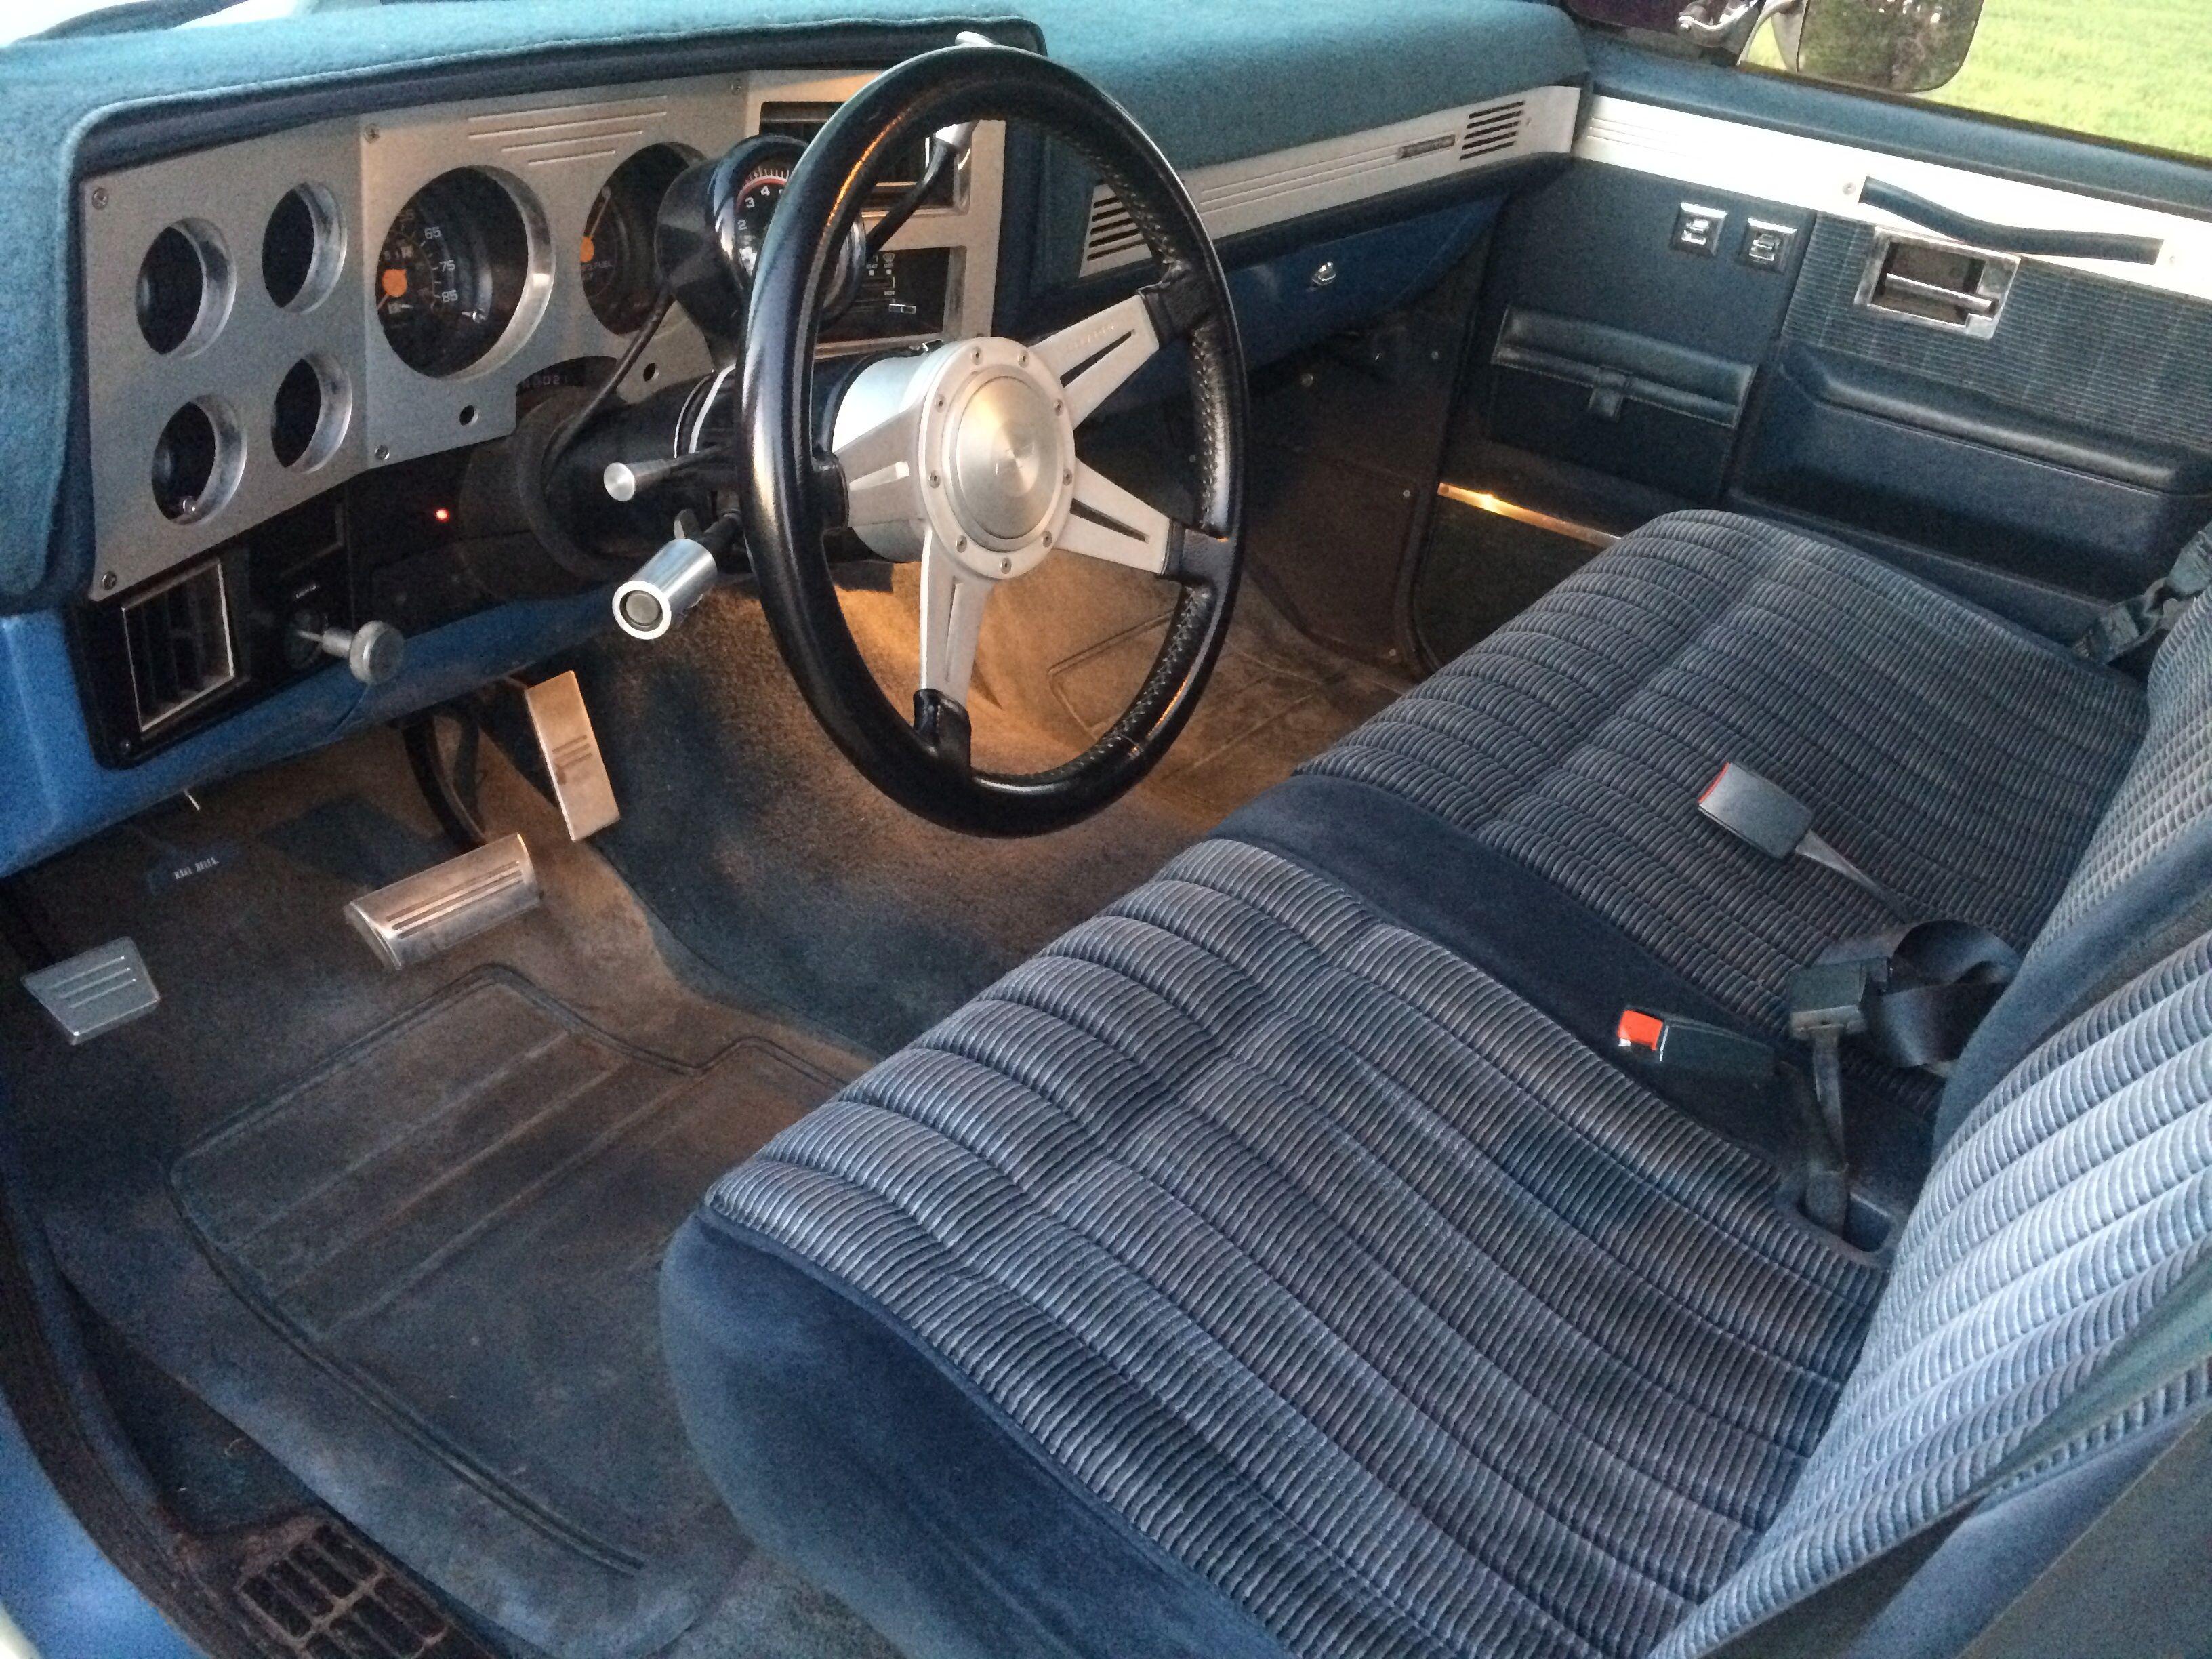 My Old 39 83 Silverado Interior Pic 2 Of 2 Note The Billet Trim 1993 Gmc Sierra Classic Bench